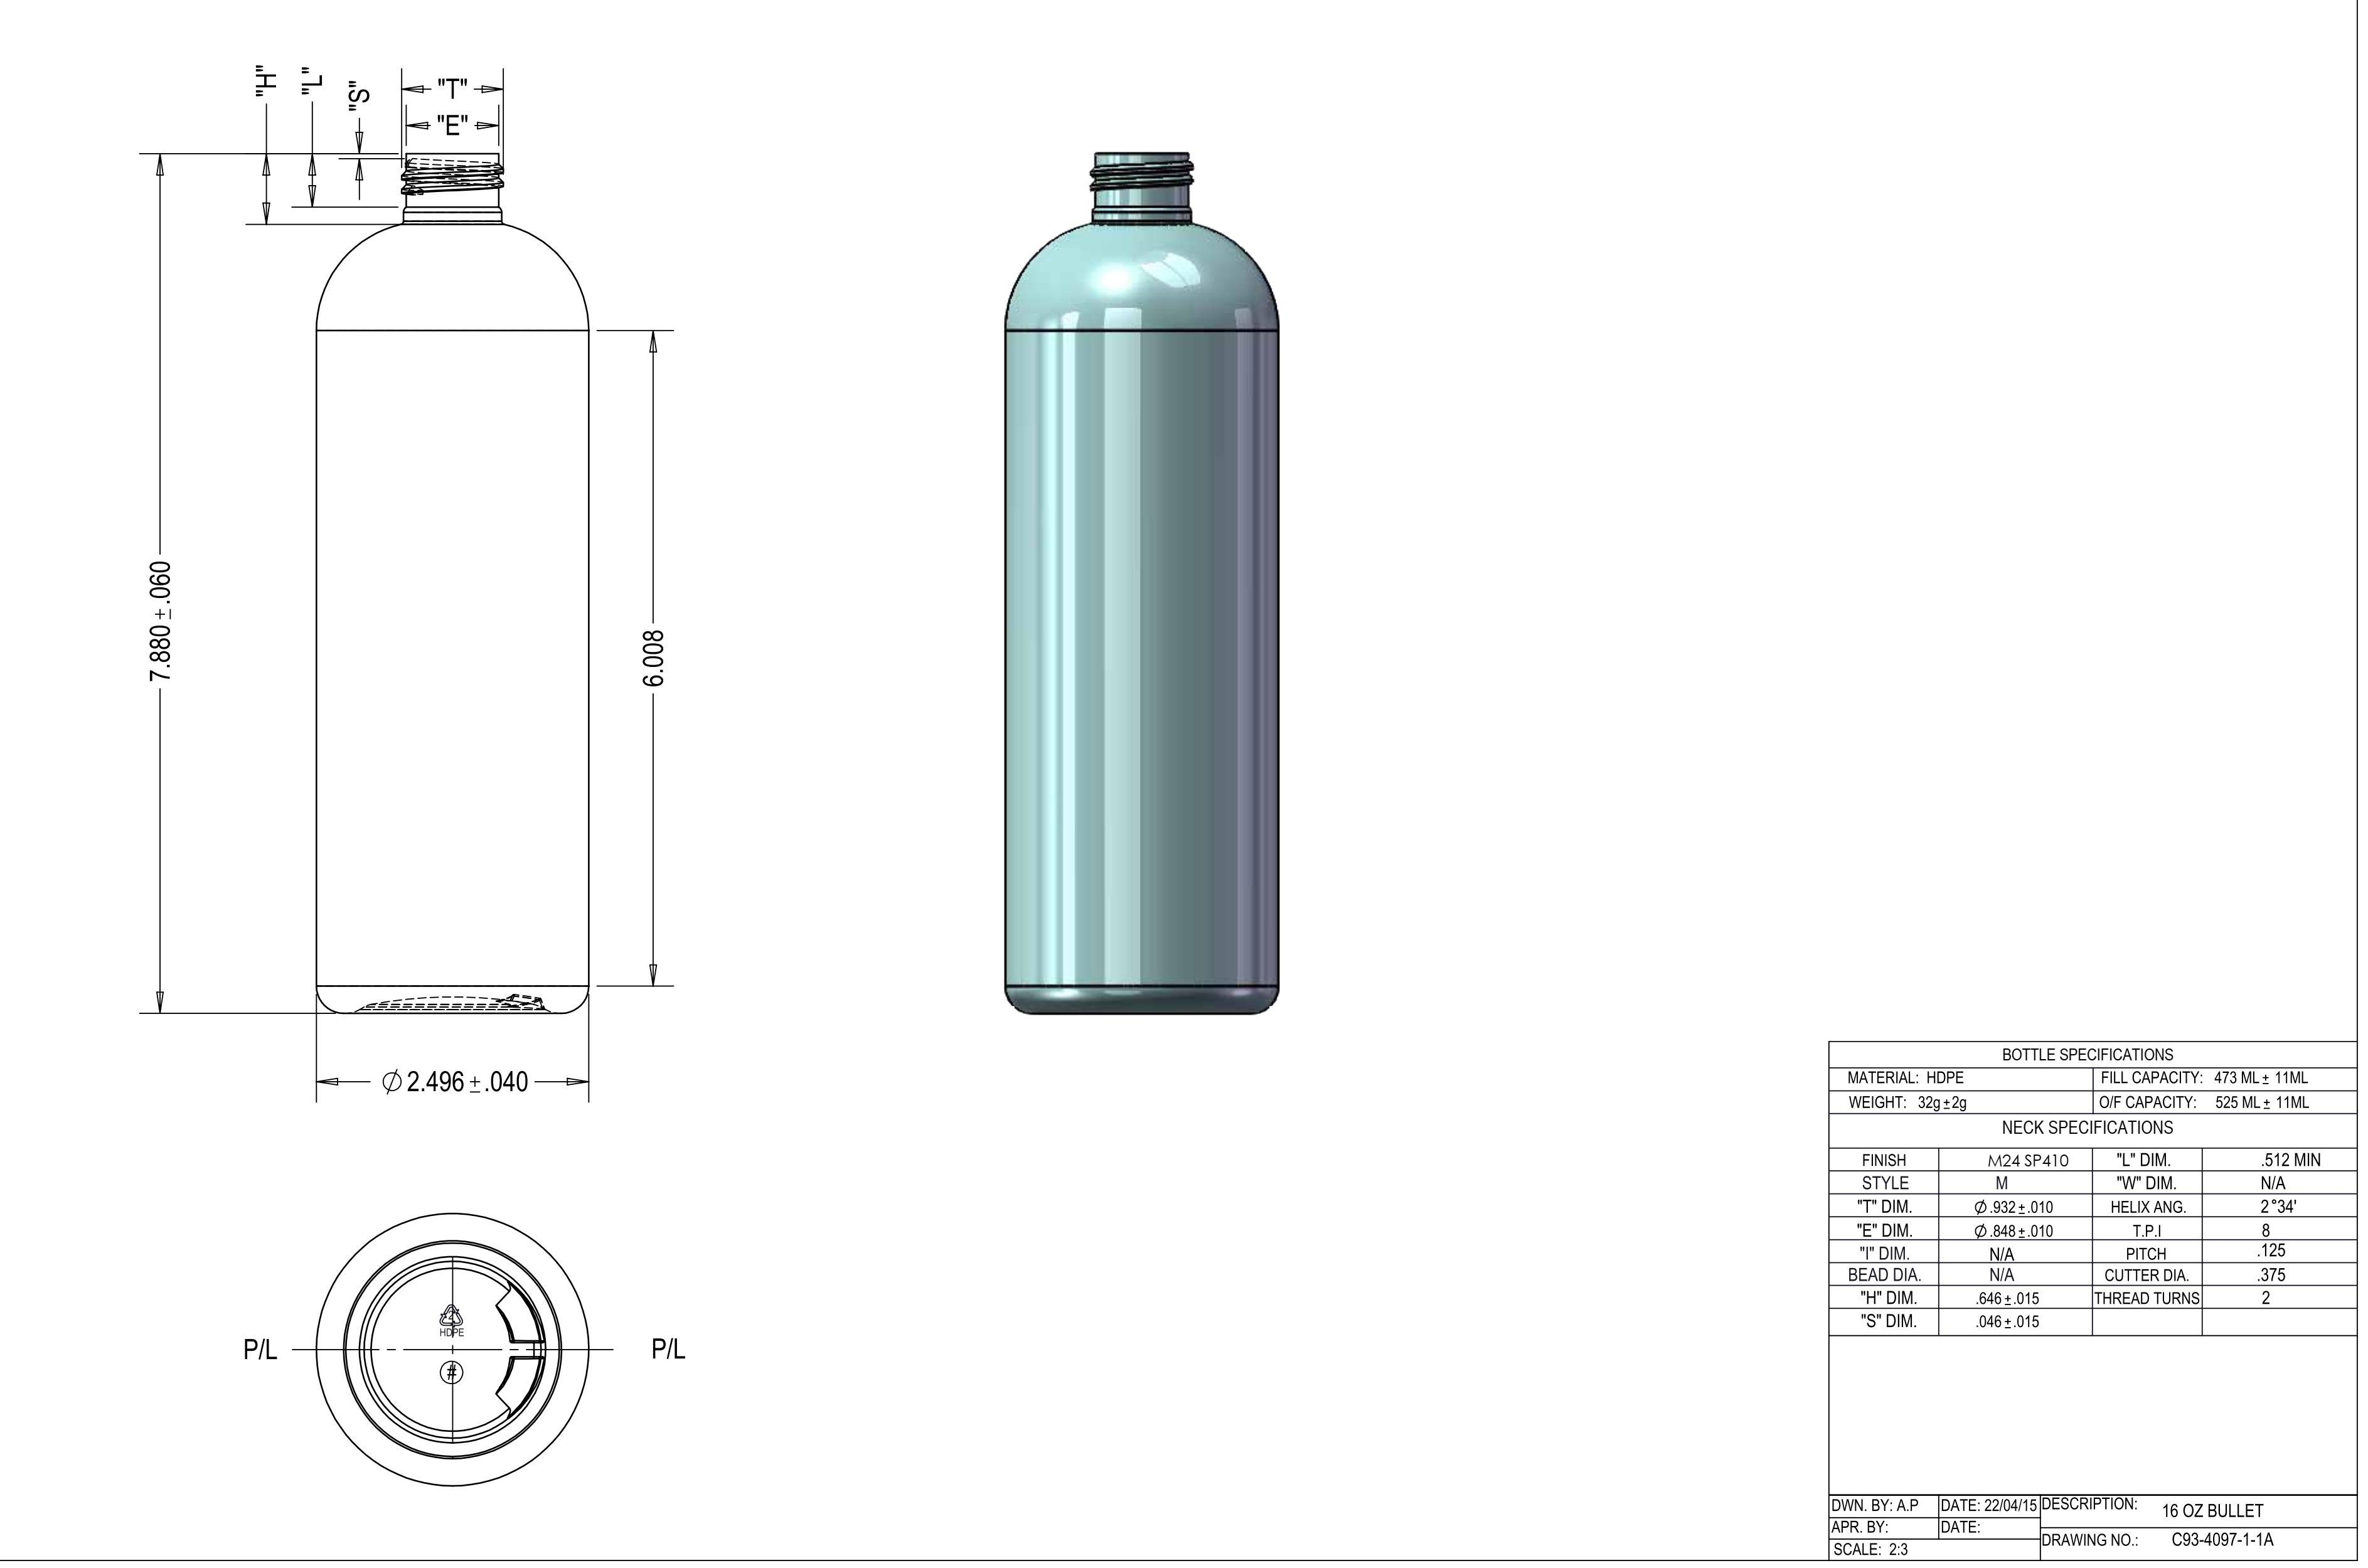 25,000 HDPE Bottles, NATURAL, NEW, 24/410 Neck, 16oz Boston Round - Image 5 of 6